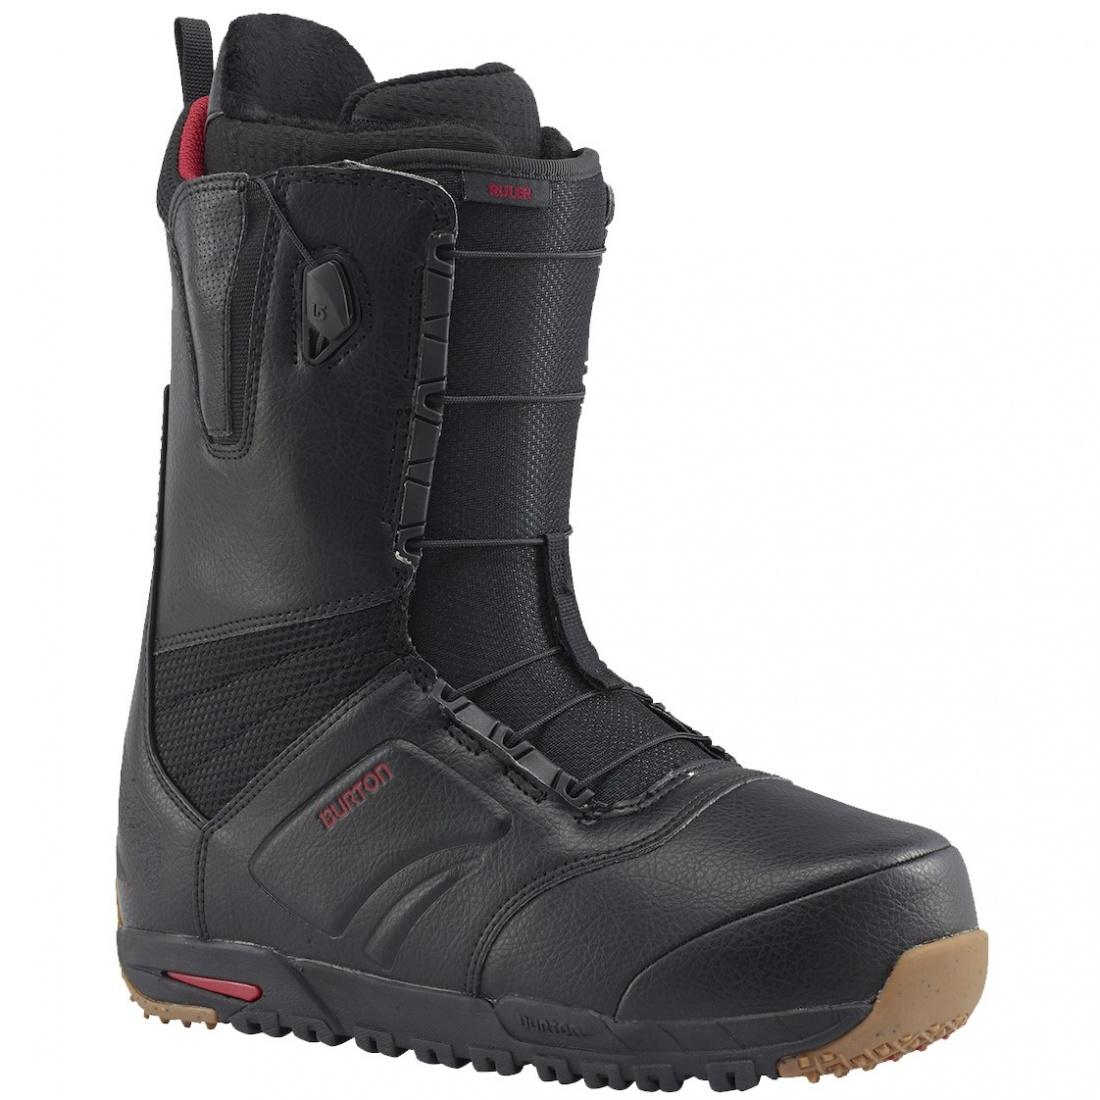 Ботинки для сноуборда Burton Ruler Black 10